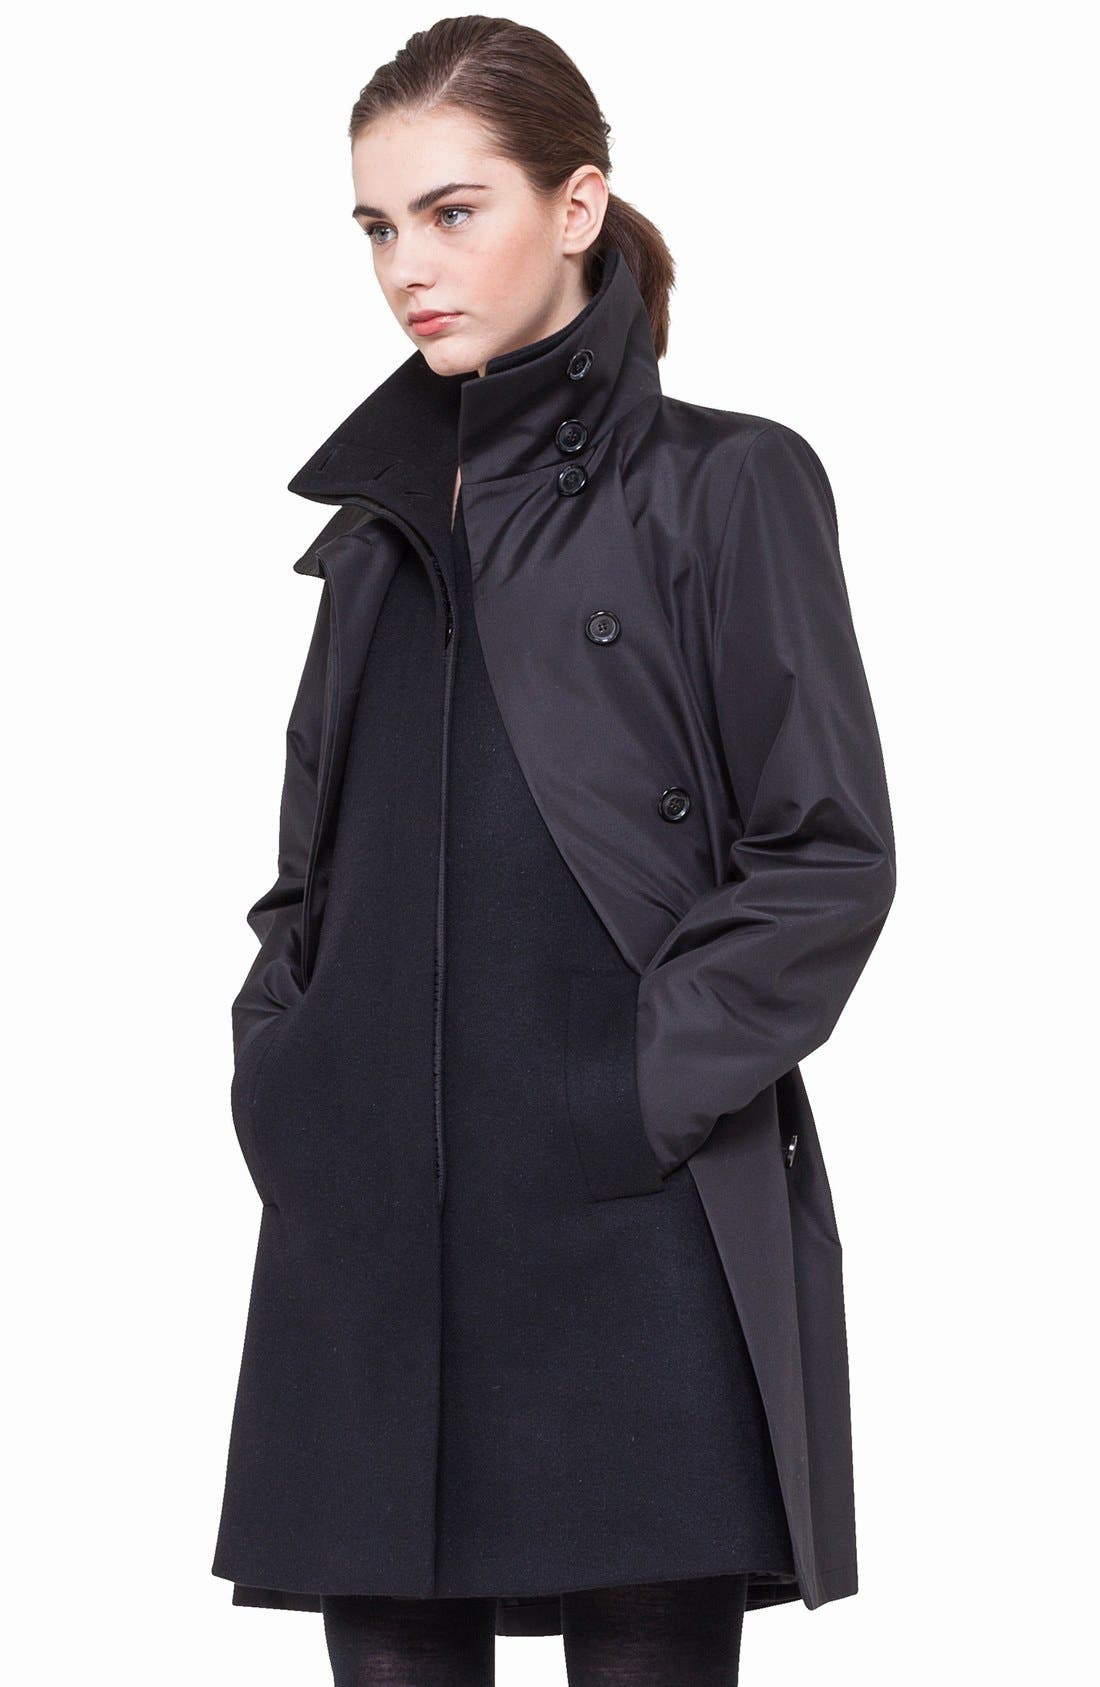 3-in-1 Technical Coat,                             Main thumbnail 1, color,                             BLACK